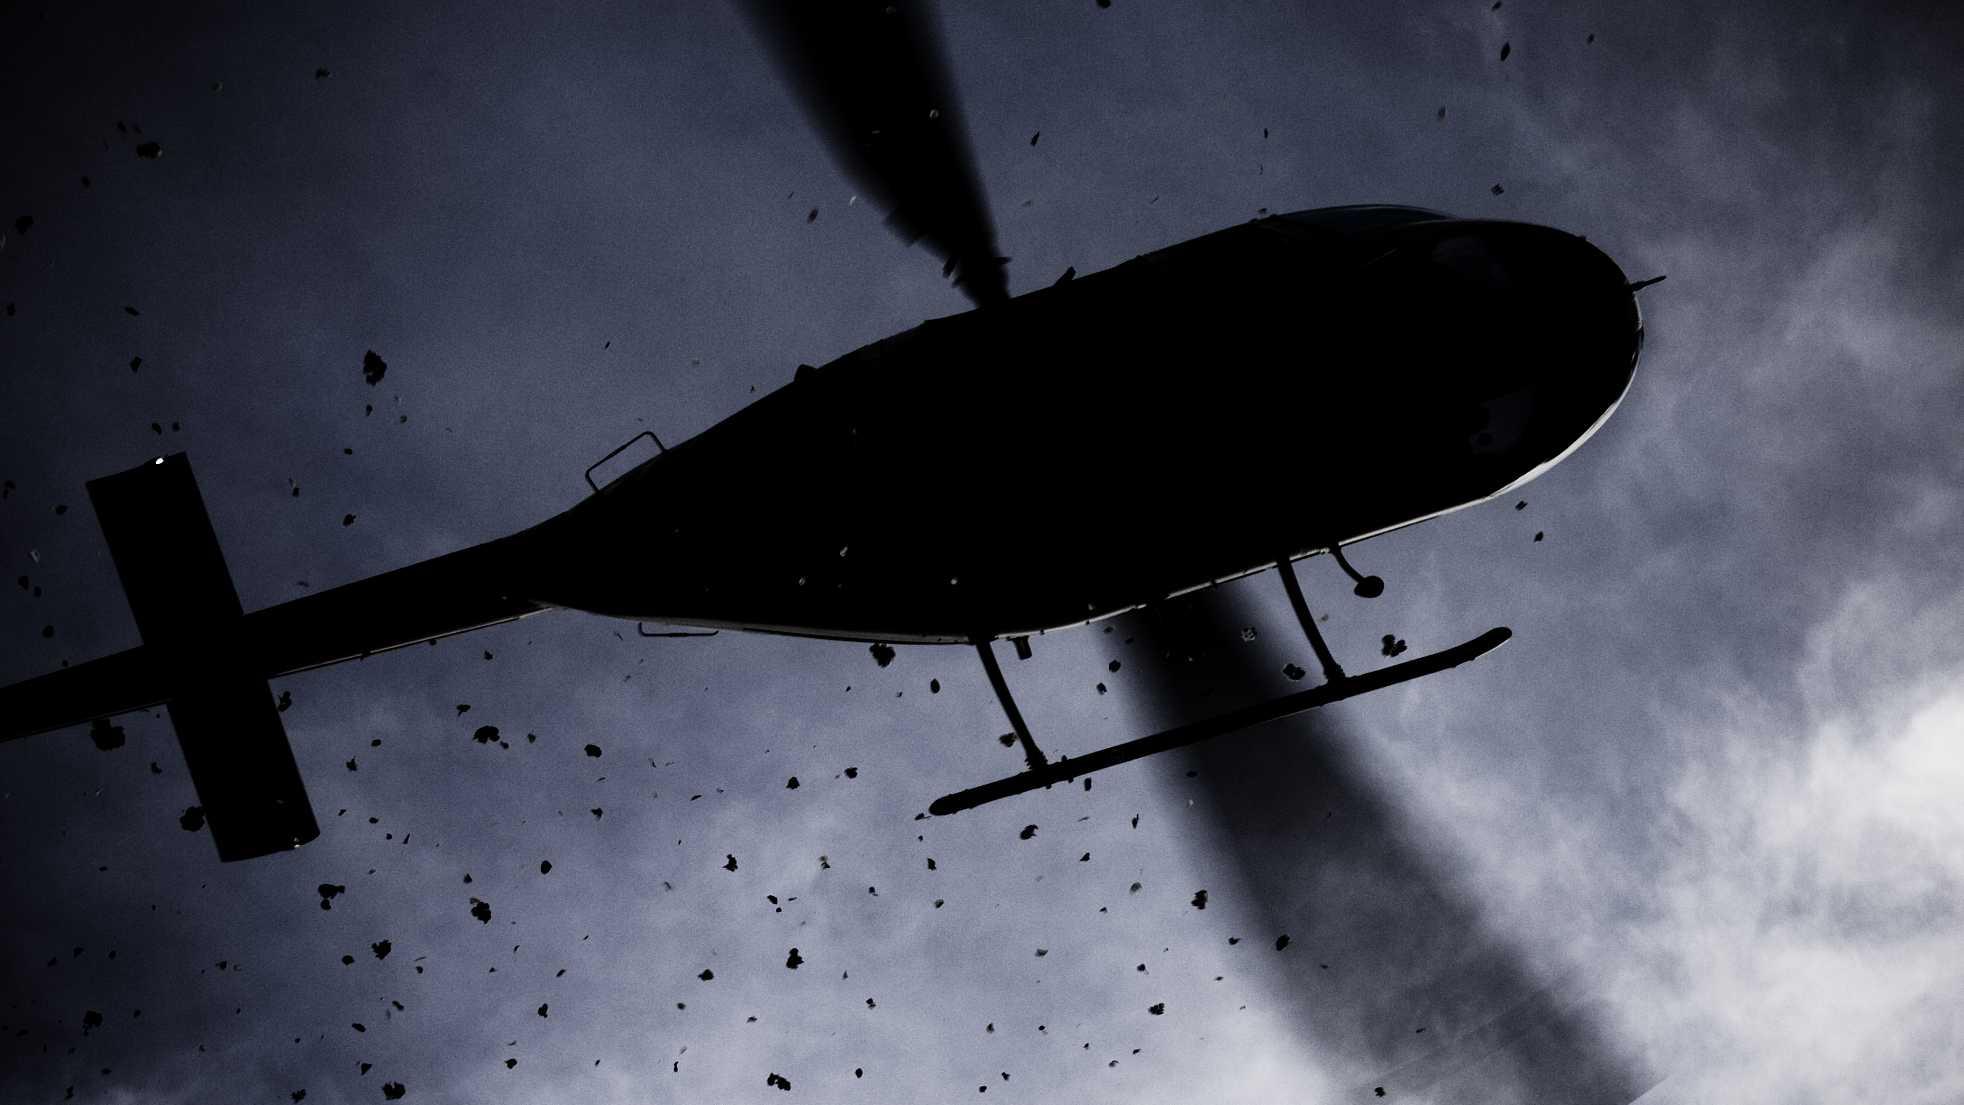 Uganda dispatches team to probe military helicopter crash